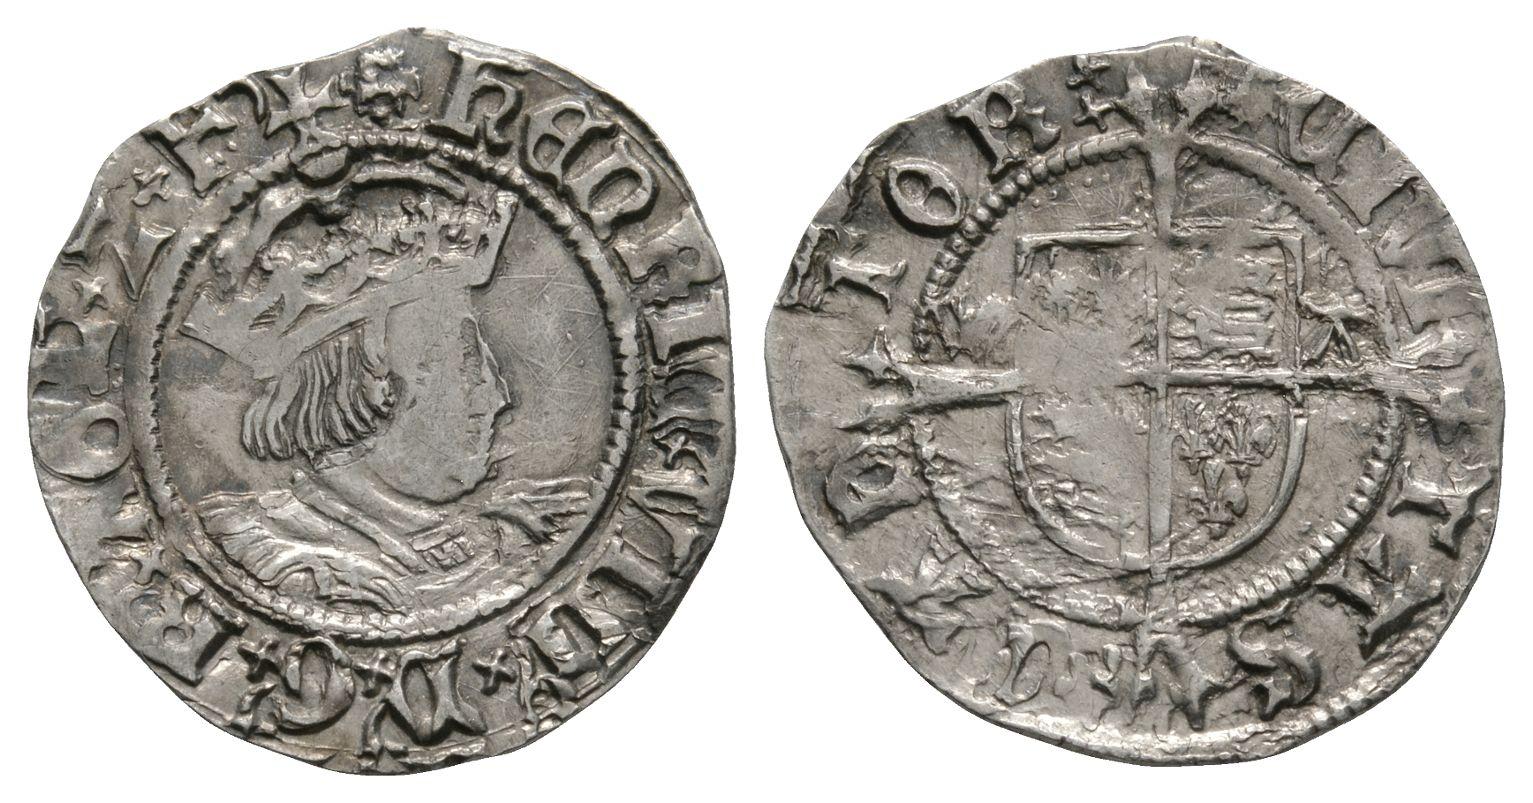 English Tudor Coins - Henry VIII - Canterbury / Warham - Profile Halfgroat